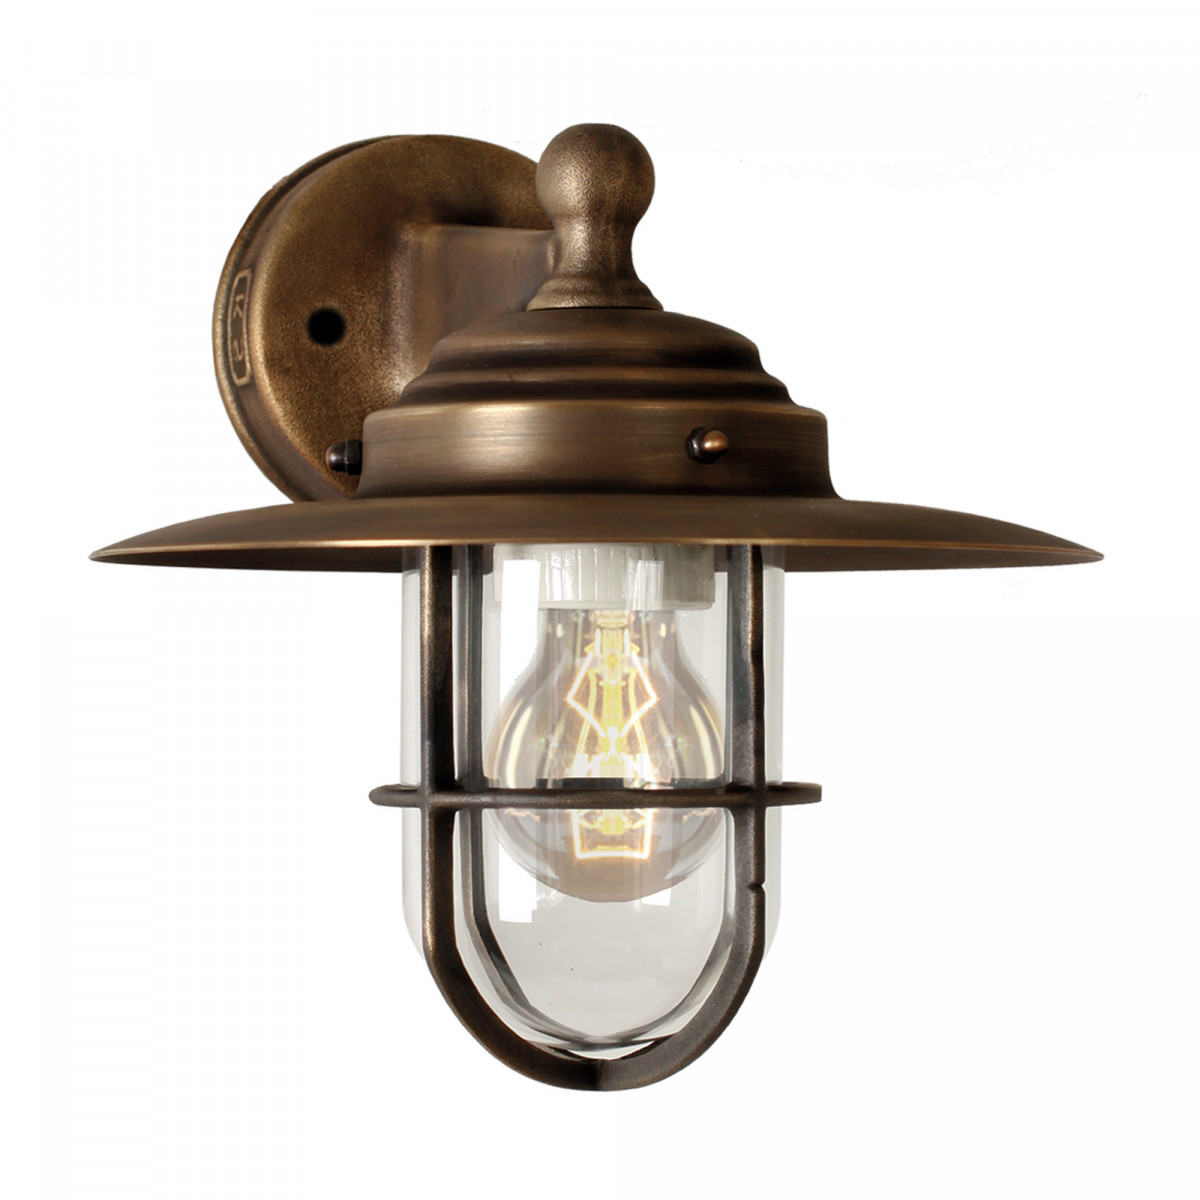 Labenne (1181) - KS Verlichting - Buitenverlichting hanglamp brons-koper